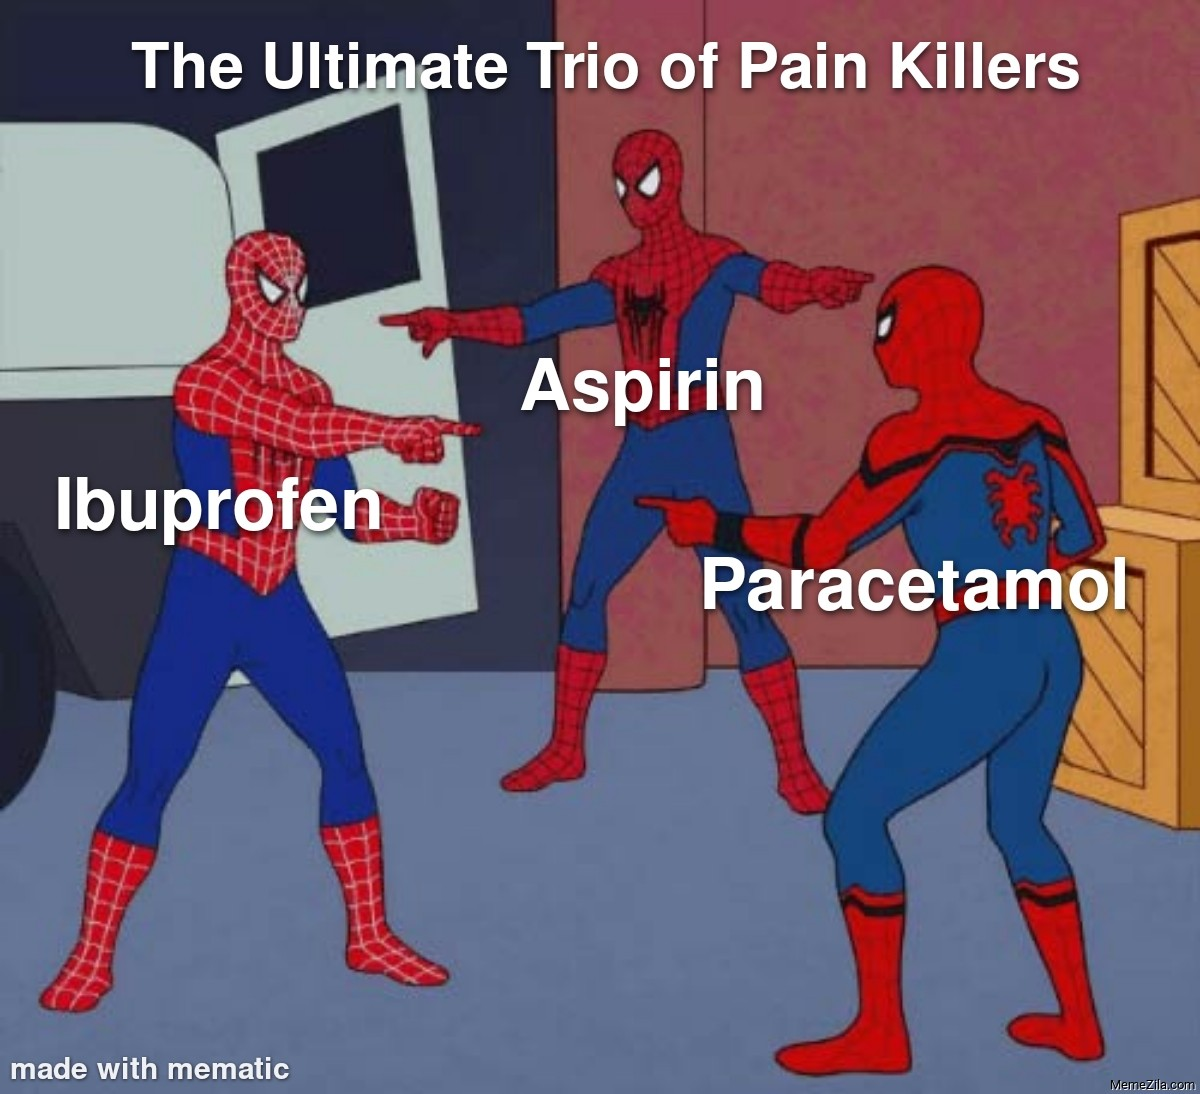 The ultimate trio of pain killers Ibuprofen Aspirin Paracetamol meme